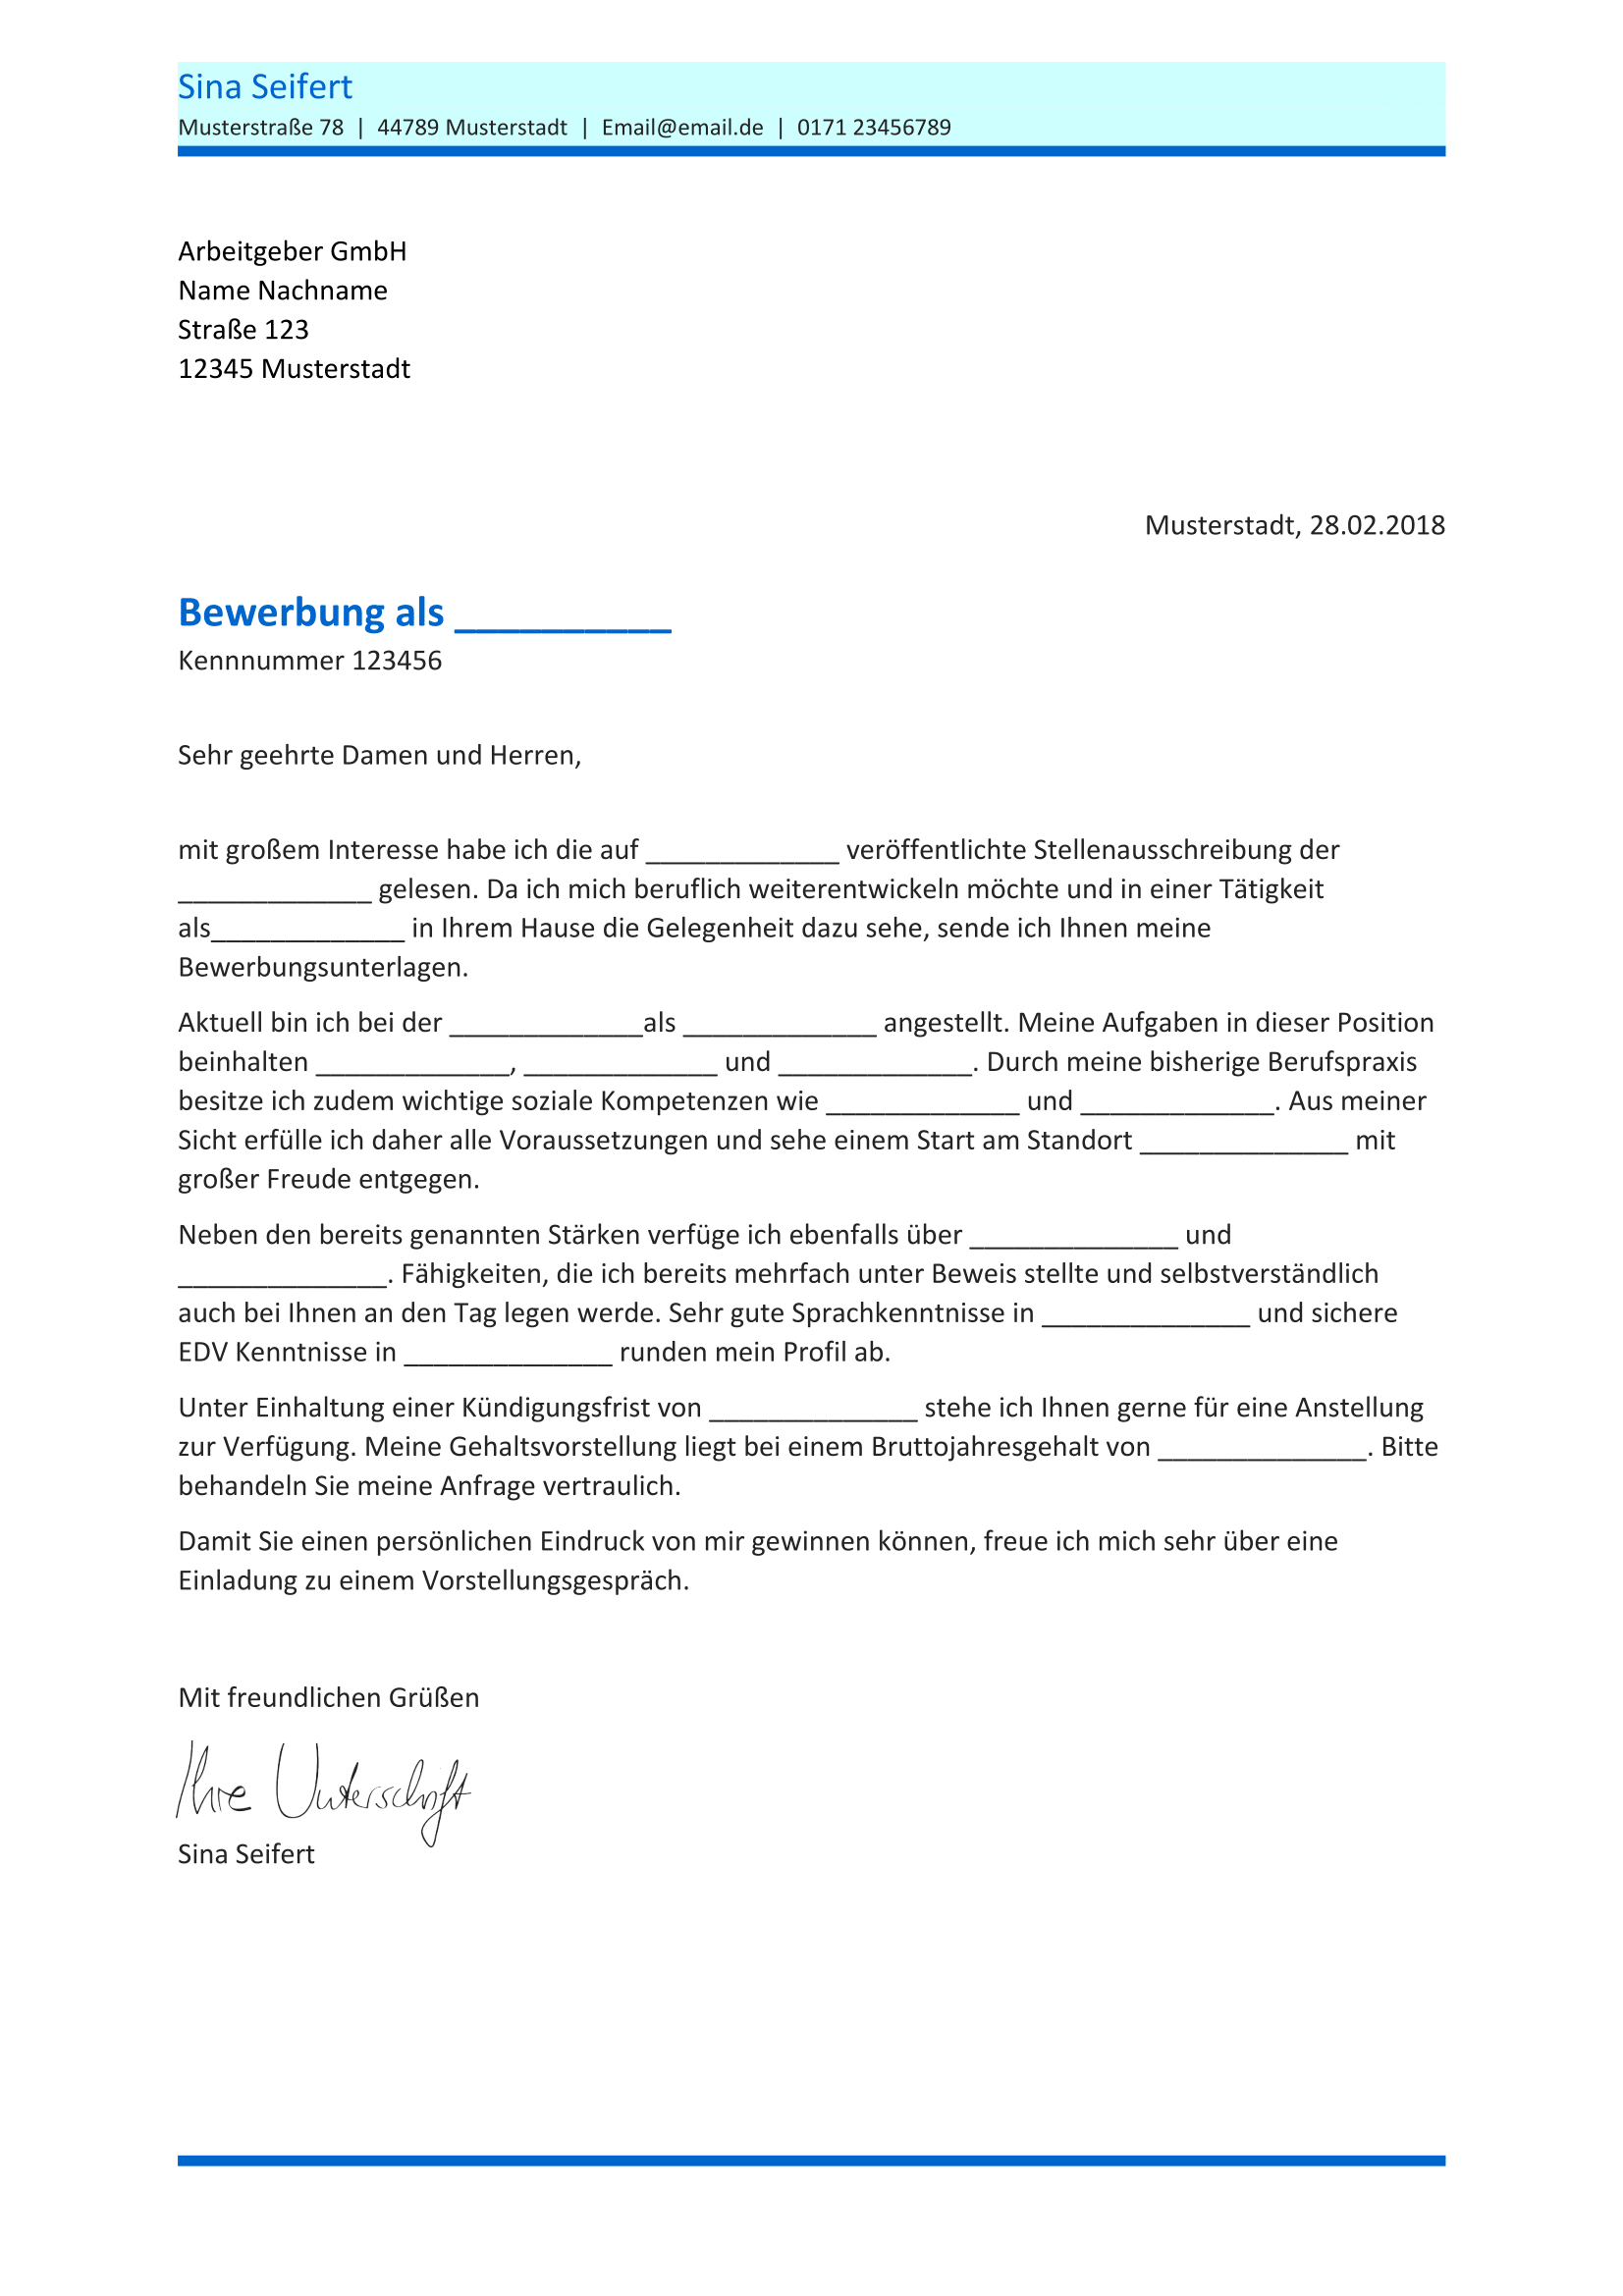 Briefprobe Briefformat Briefvorlage Bewerbung Schreiben Bewerbungsschreiben Vorlage Bewerbung